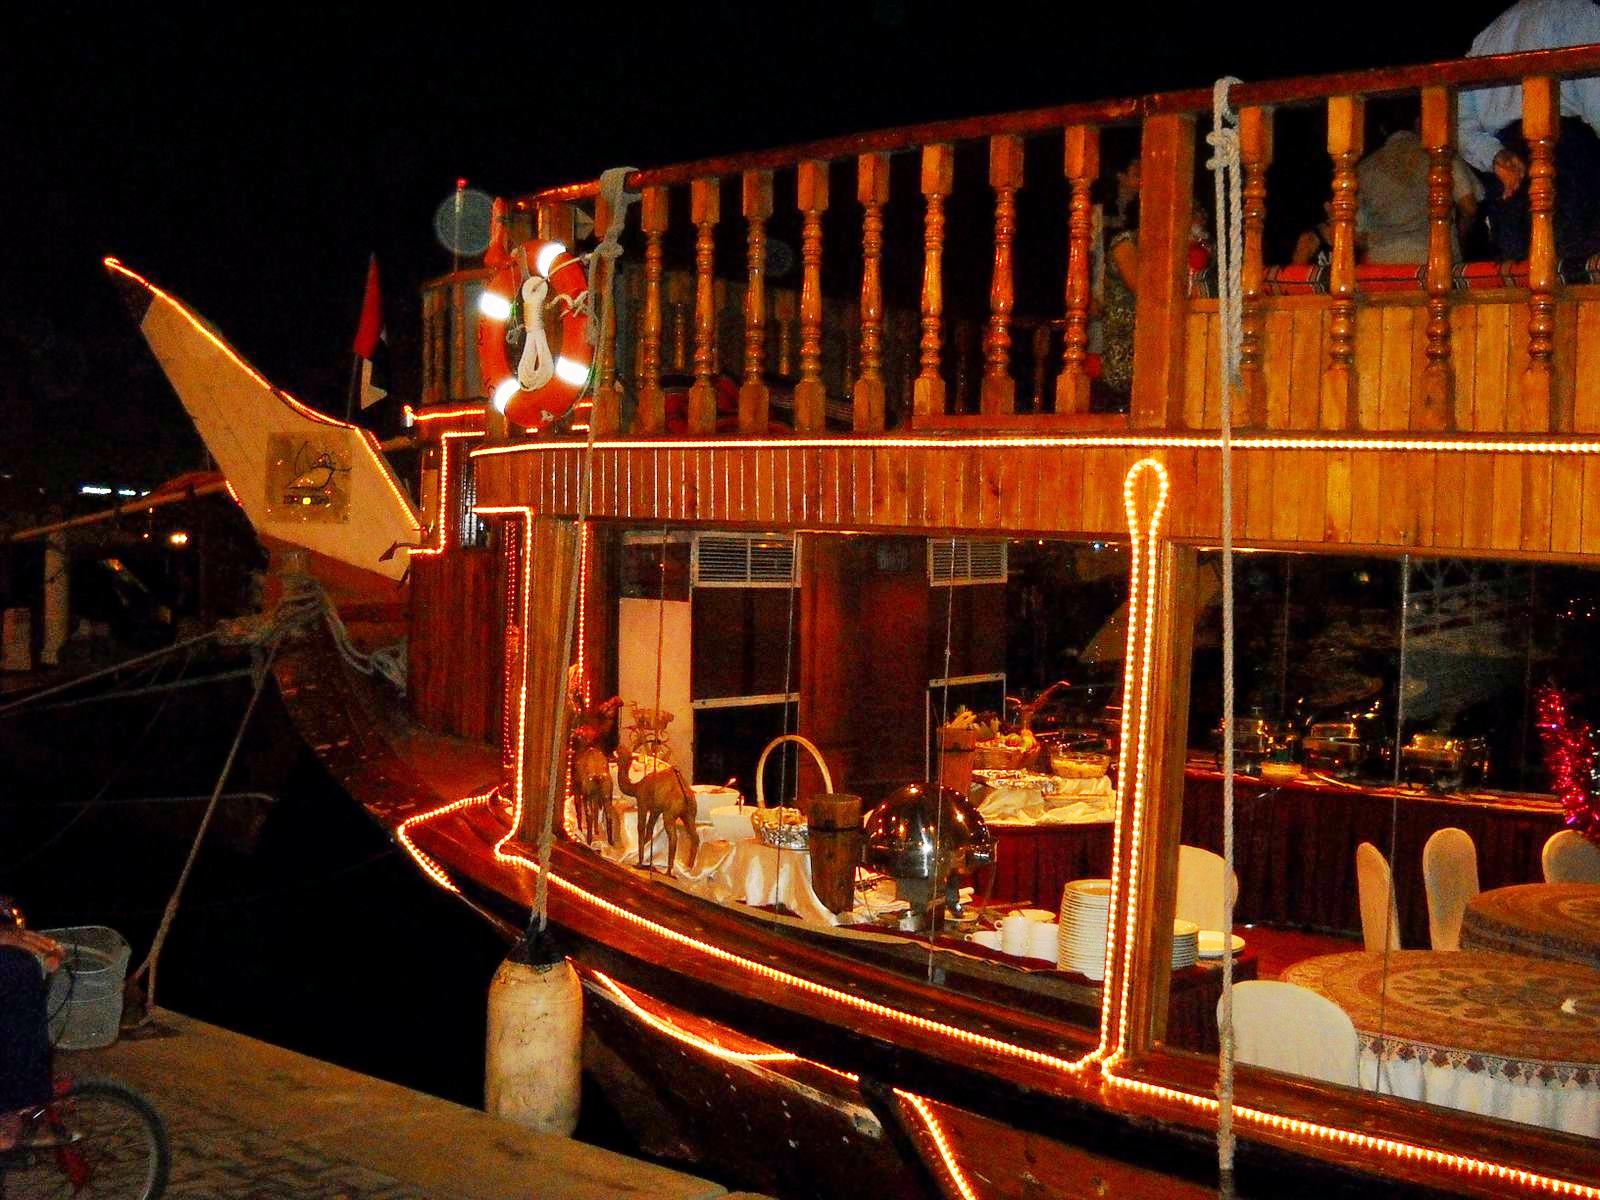 1511331438_dhow-cruise-dubai-boat-dinner-dubai-dubai-city-tour-boat-party-dubai-dhowcruise-dubai-dubai-dhow-cruise-boat-dinner-dubai-02.jpg